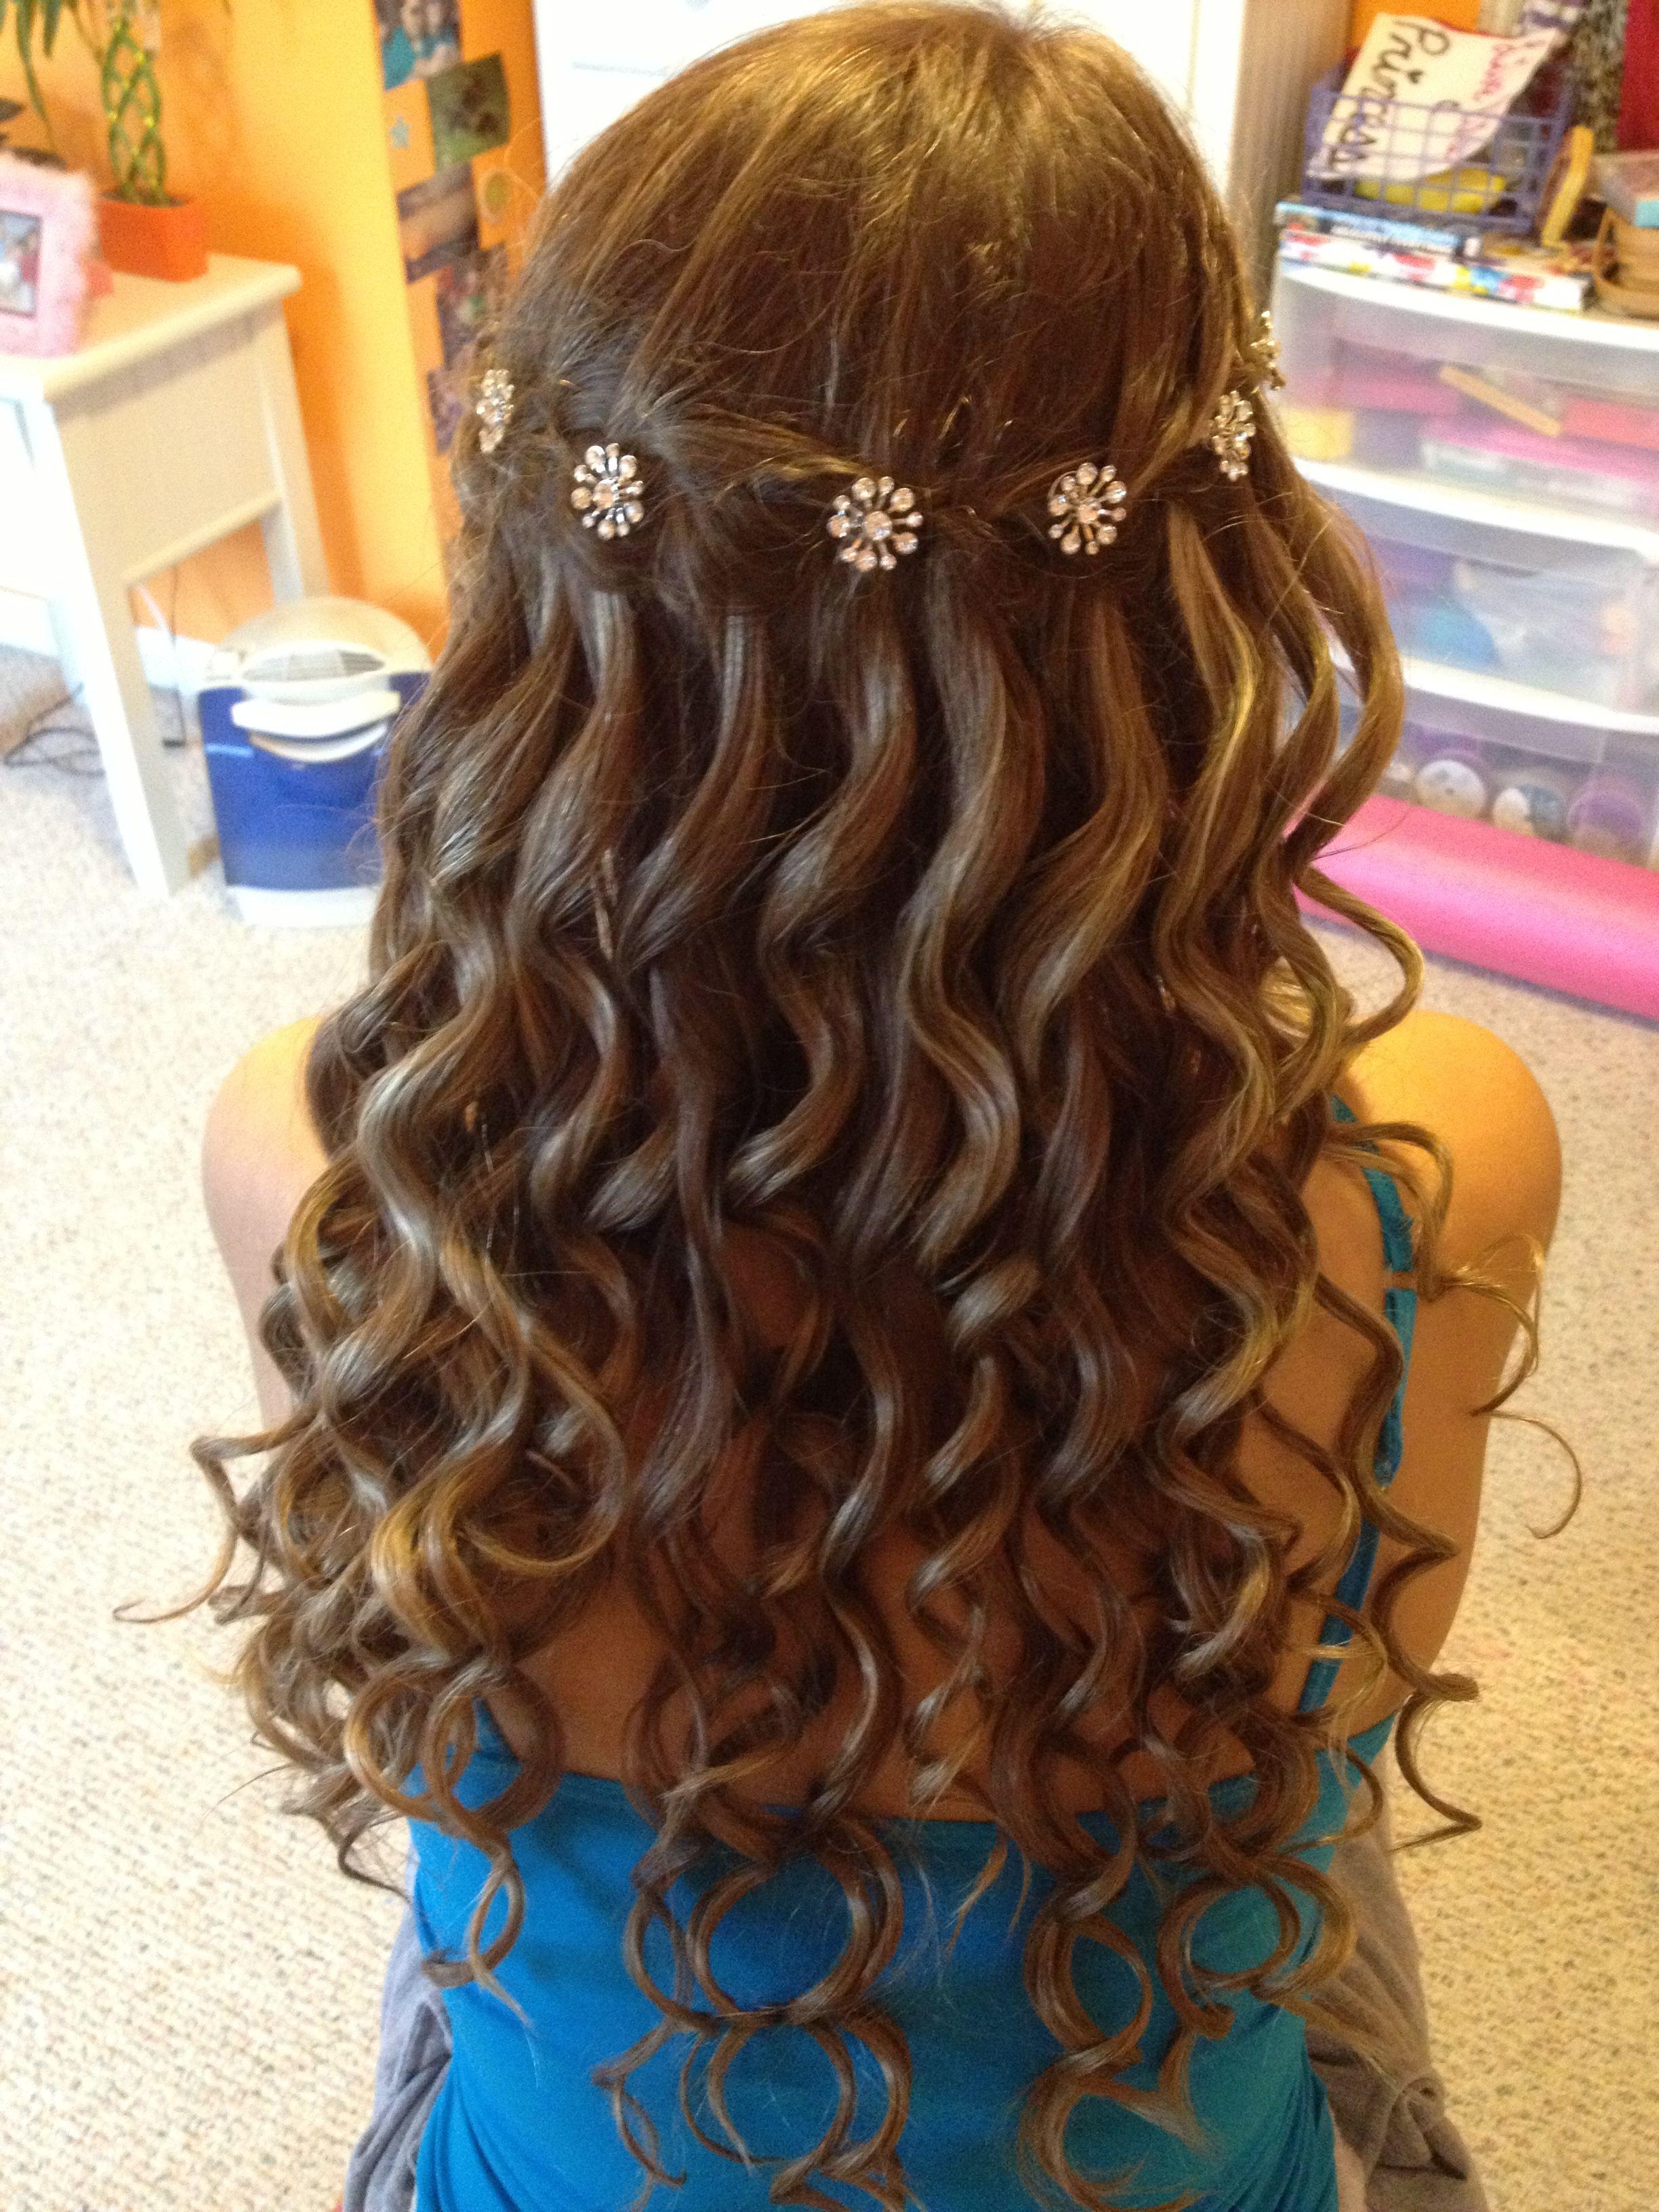 waterfall braid with curls hair styles pinterest